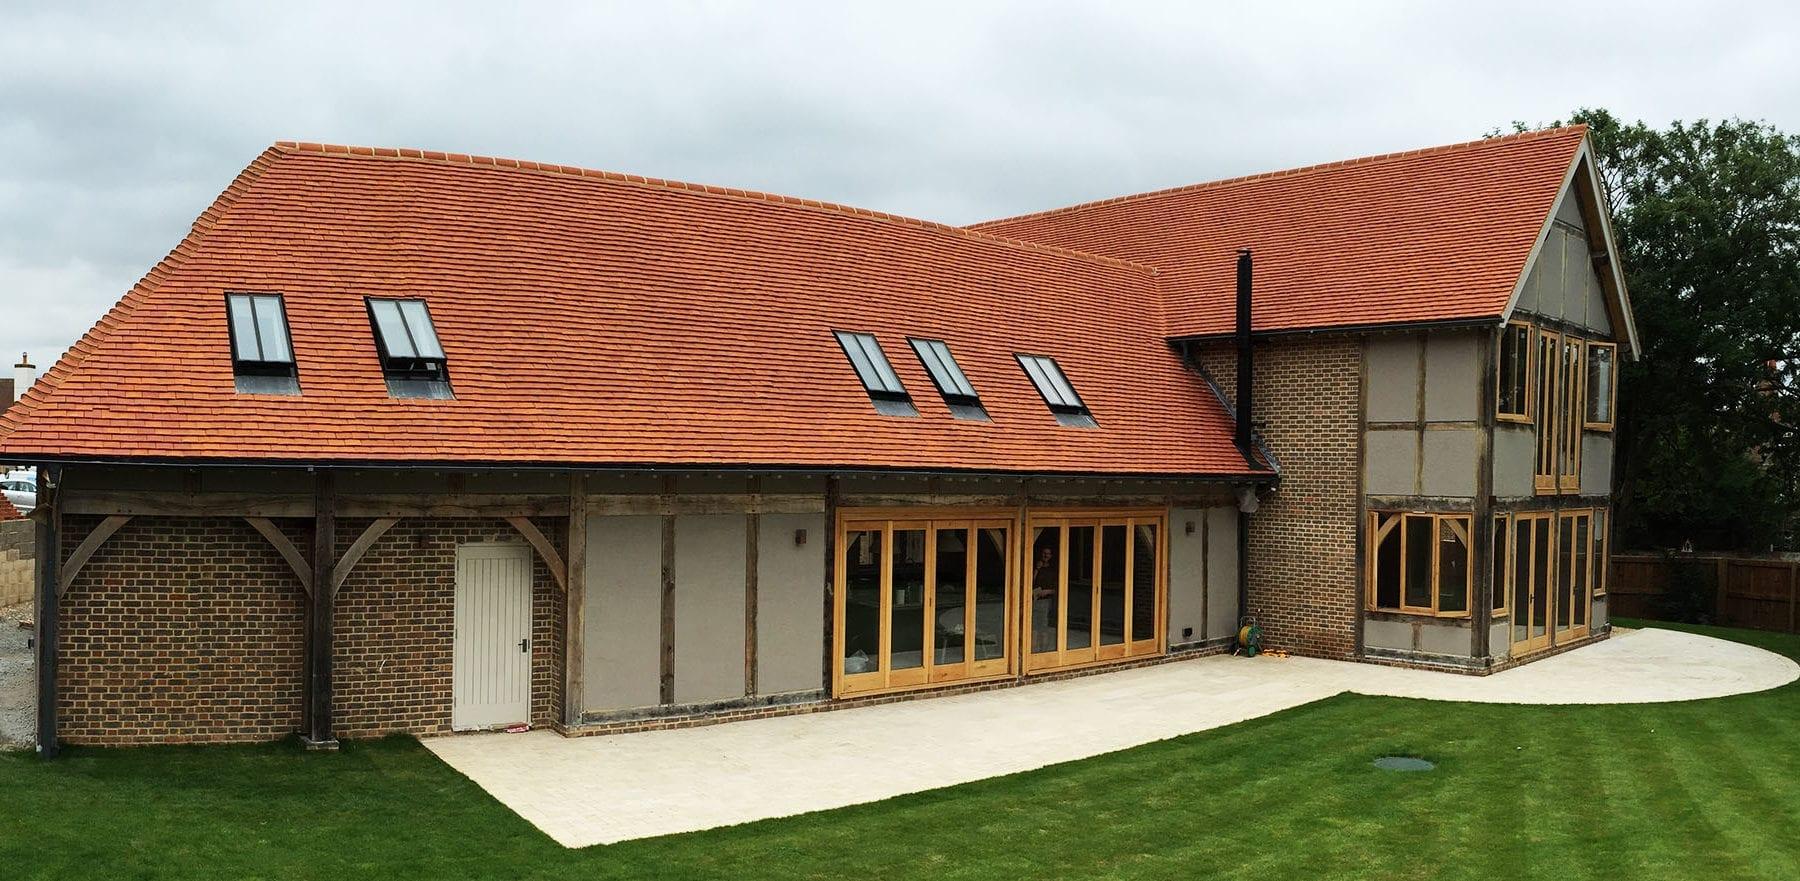 Lifestiles - Handcrafted Orange Clay Roof Tiles - Upthorpe, England 3